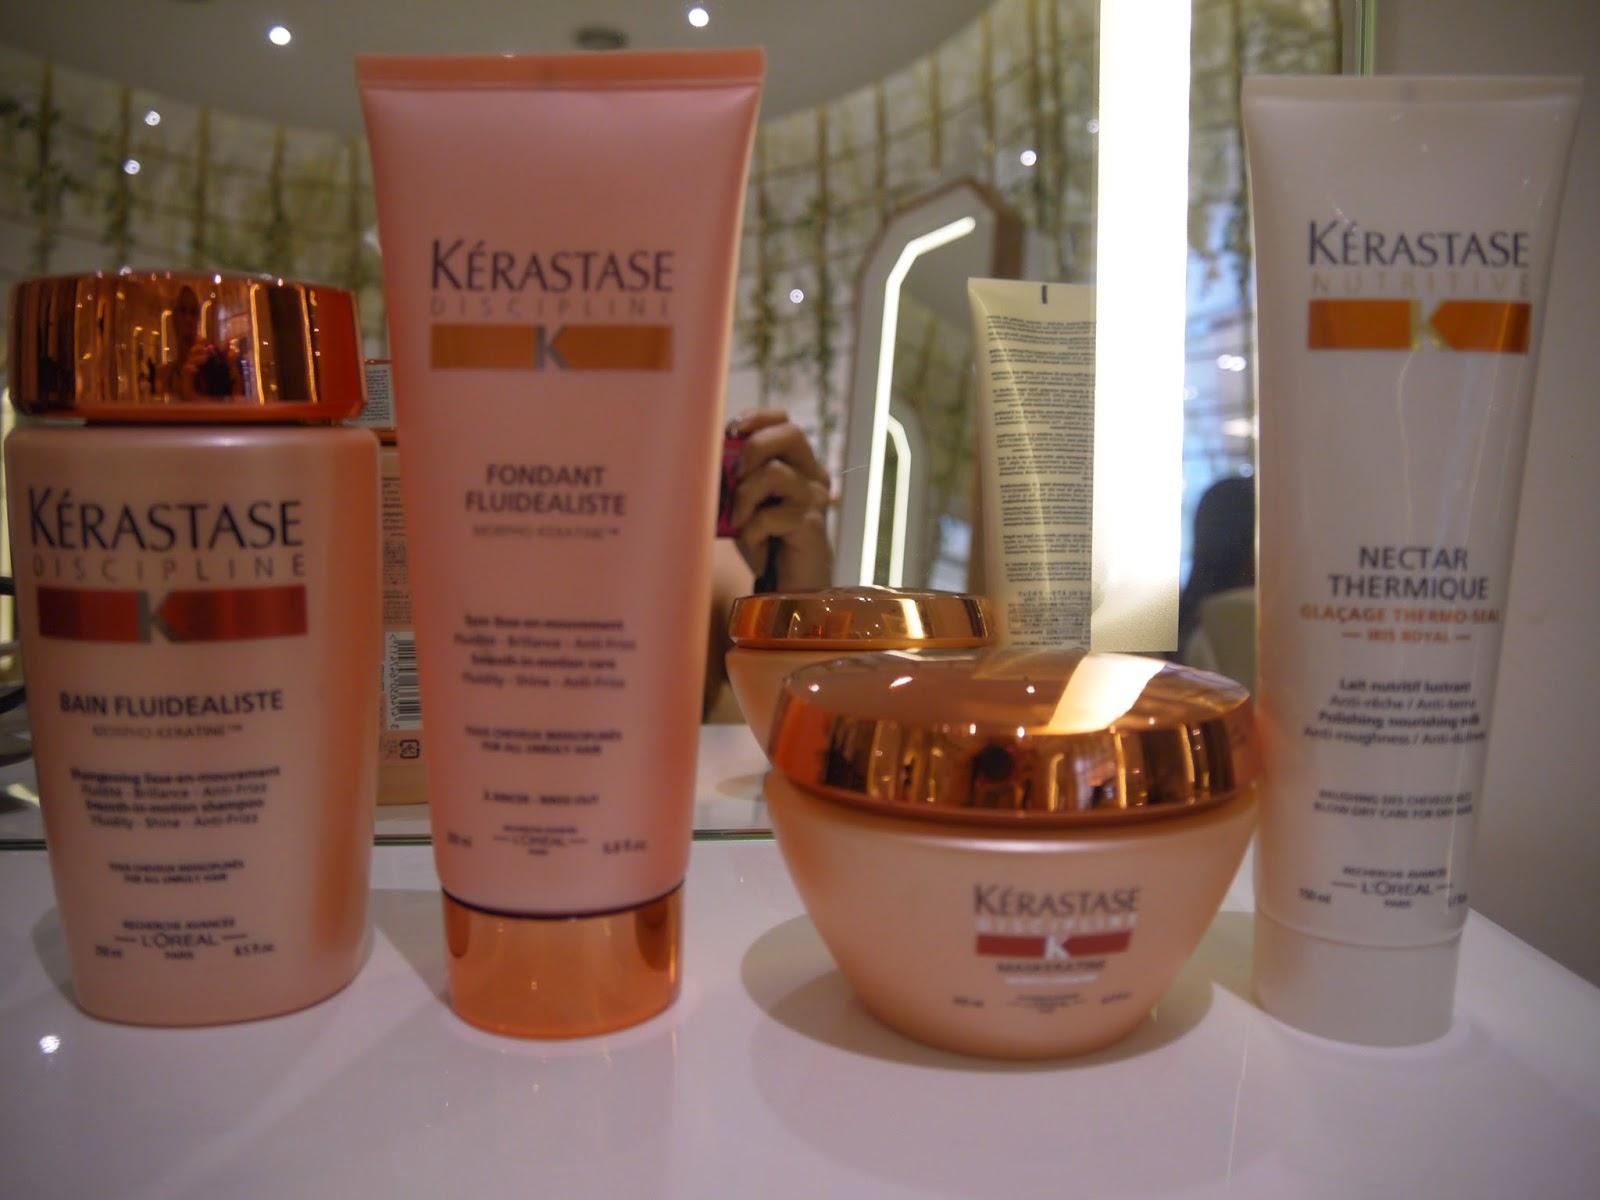 Evergreen love kerastase discipline hair treatment review - Kerastase salon treatment ...